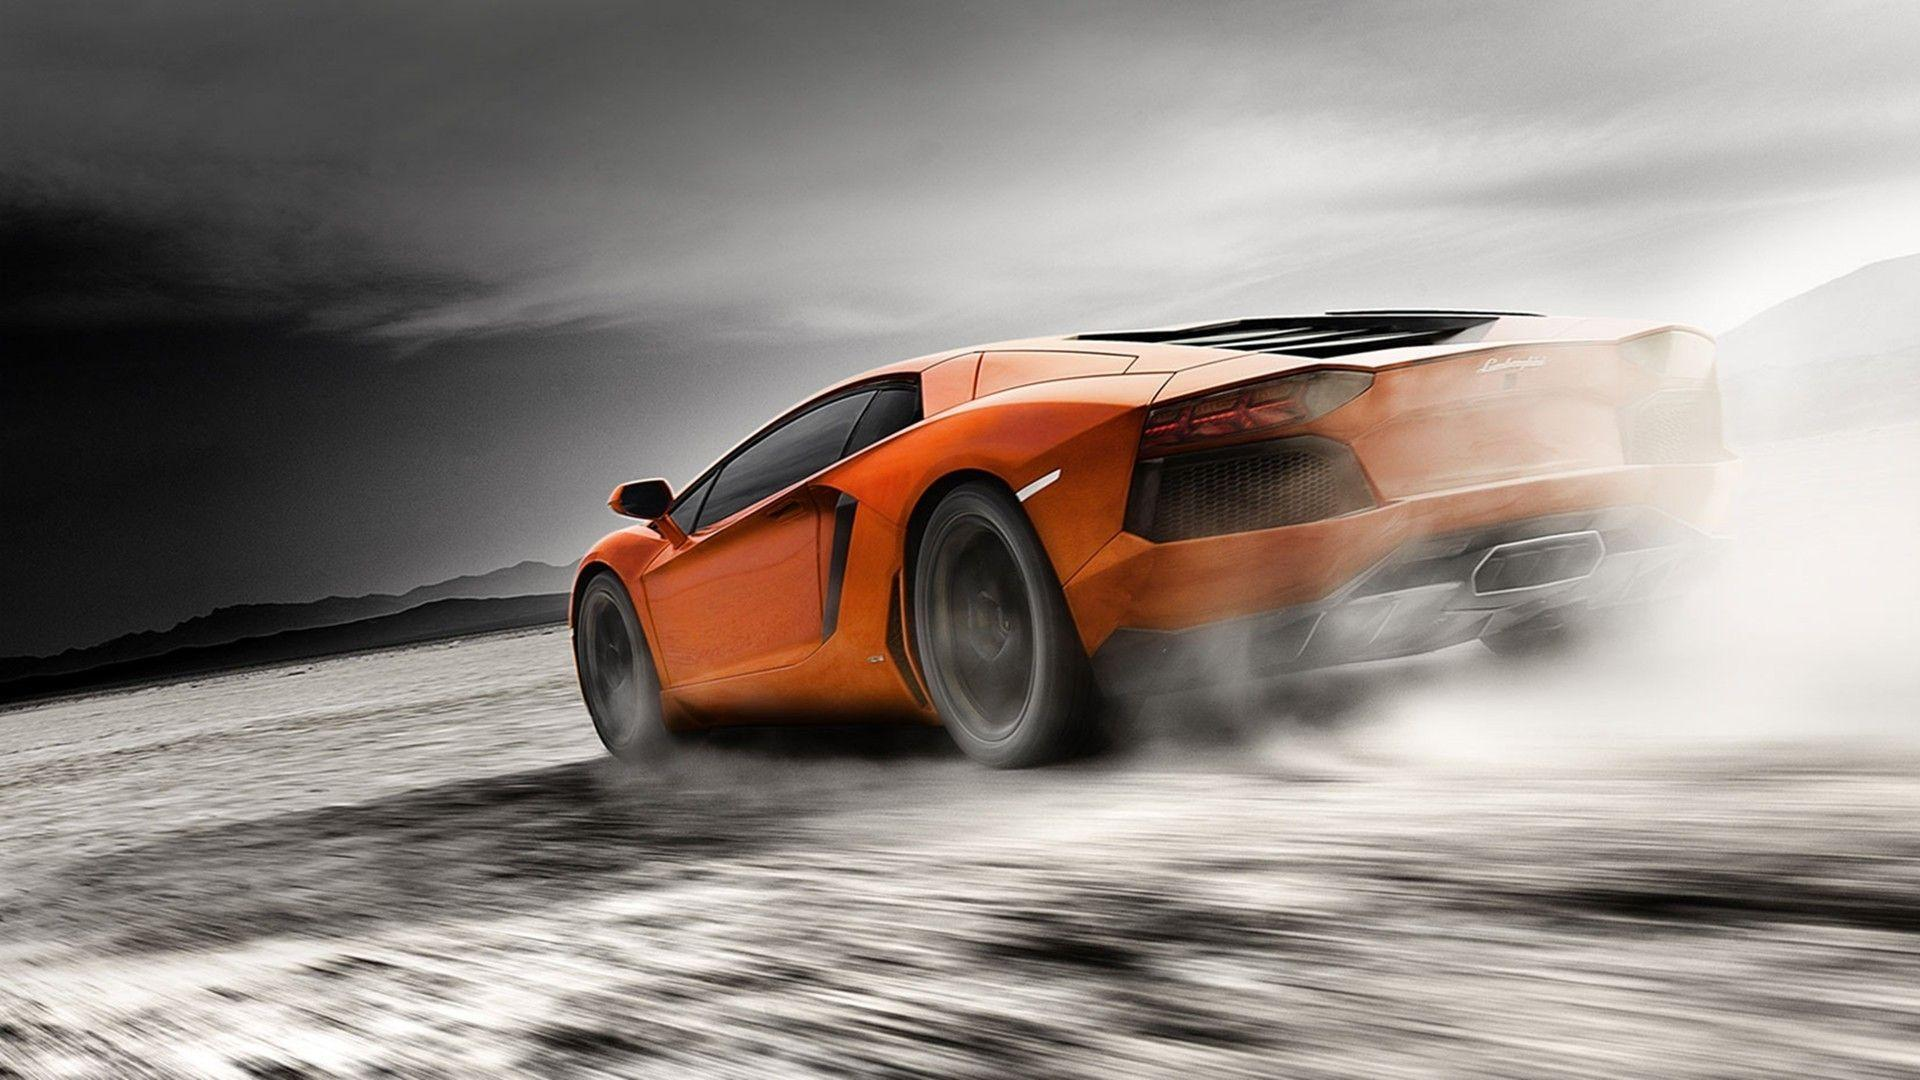 Lamborghini Aventador Car Racing Games